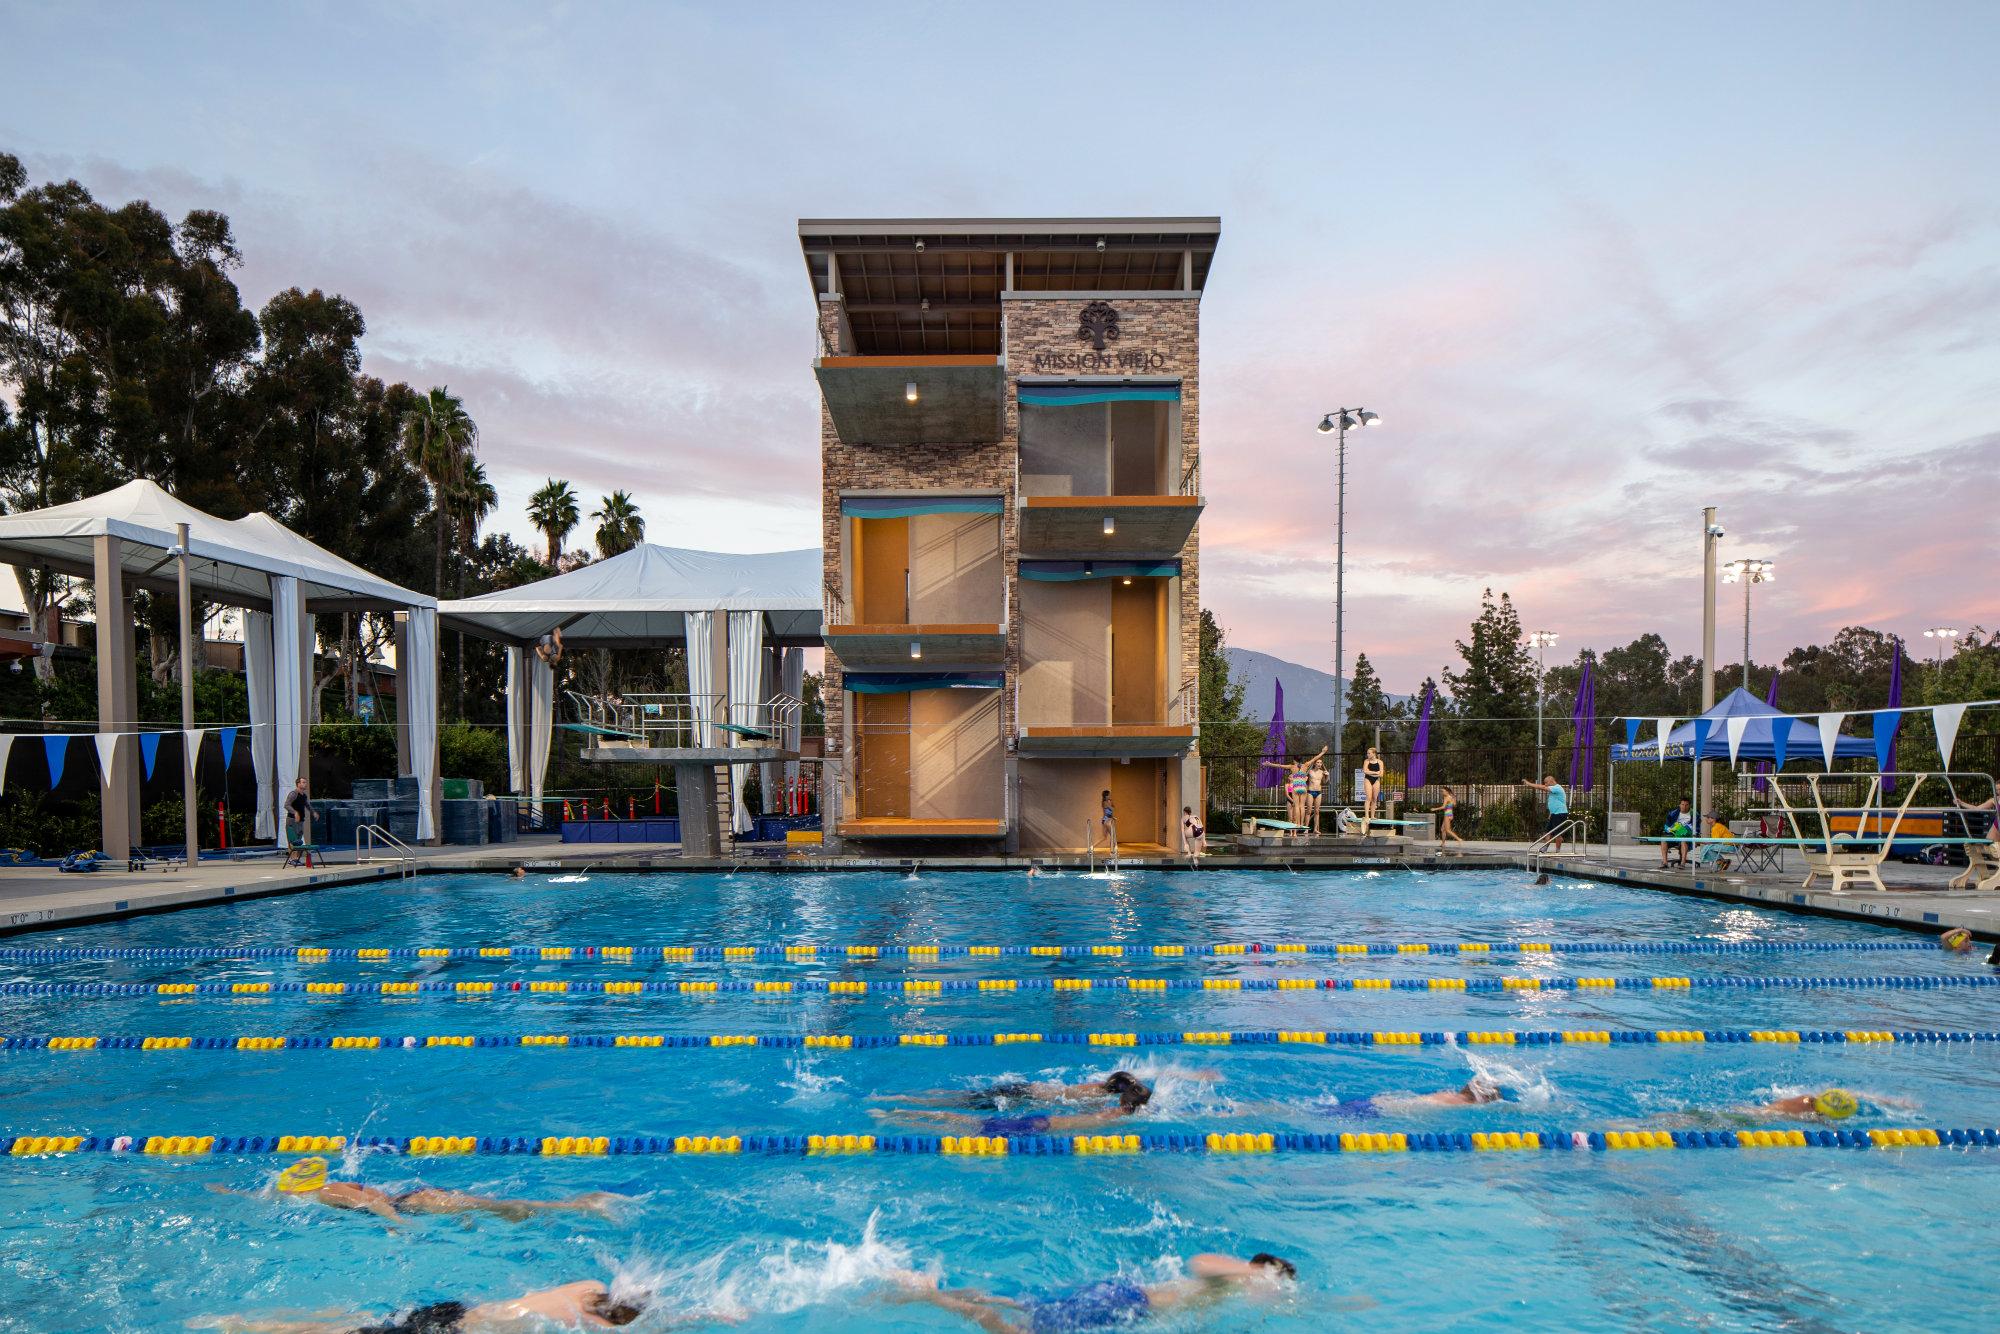 Marguerite Aquatics Complex Brings Home Ai 2019 Dream